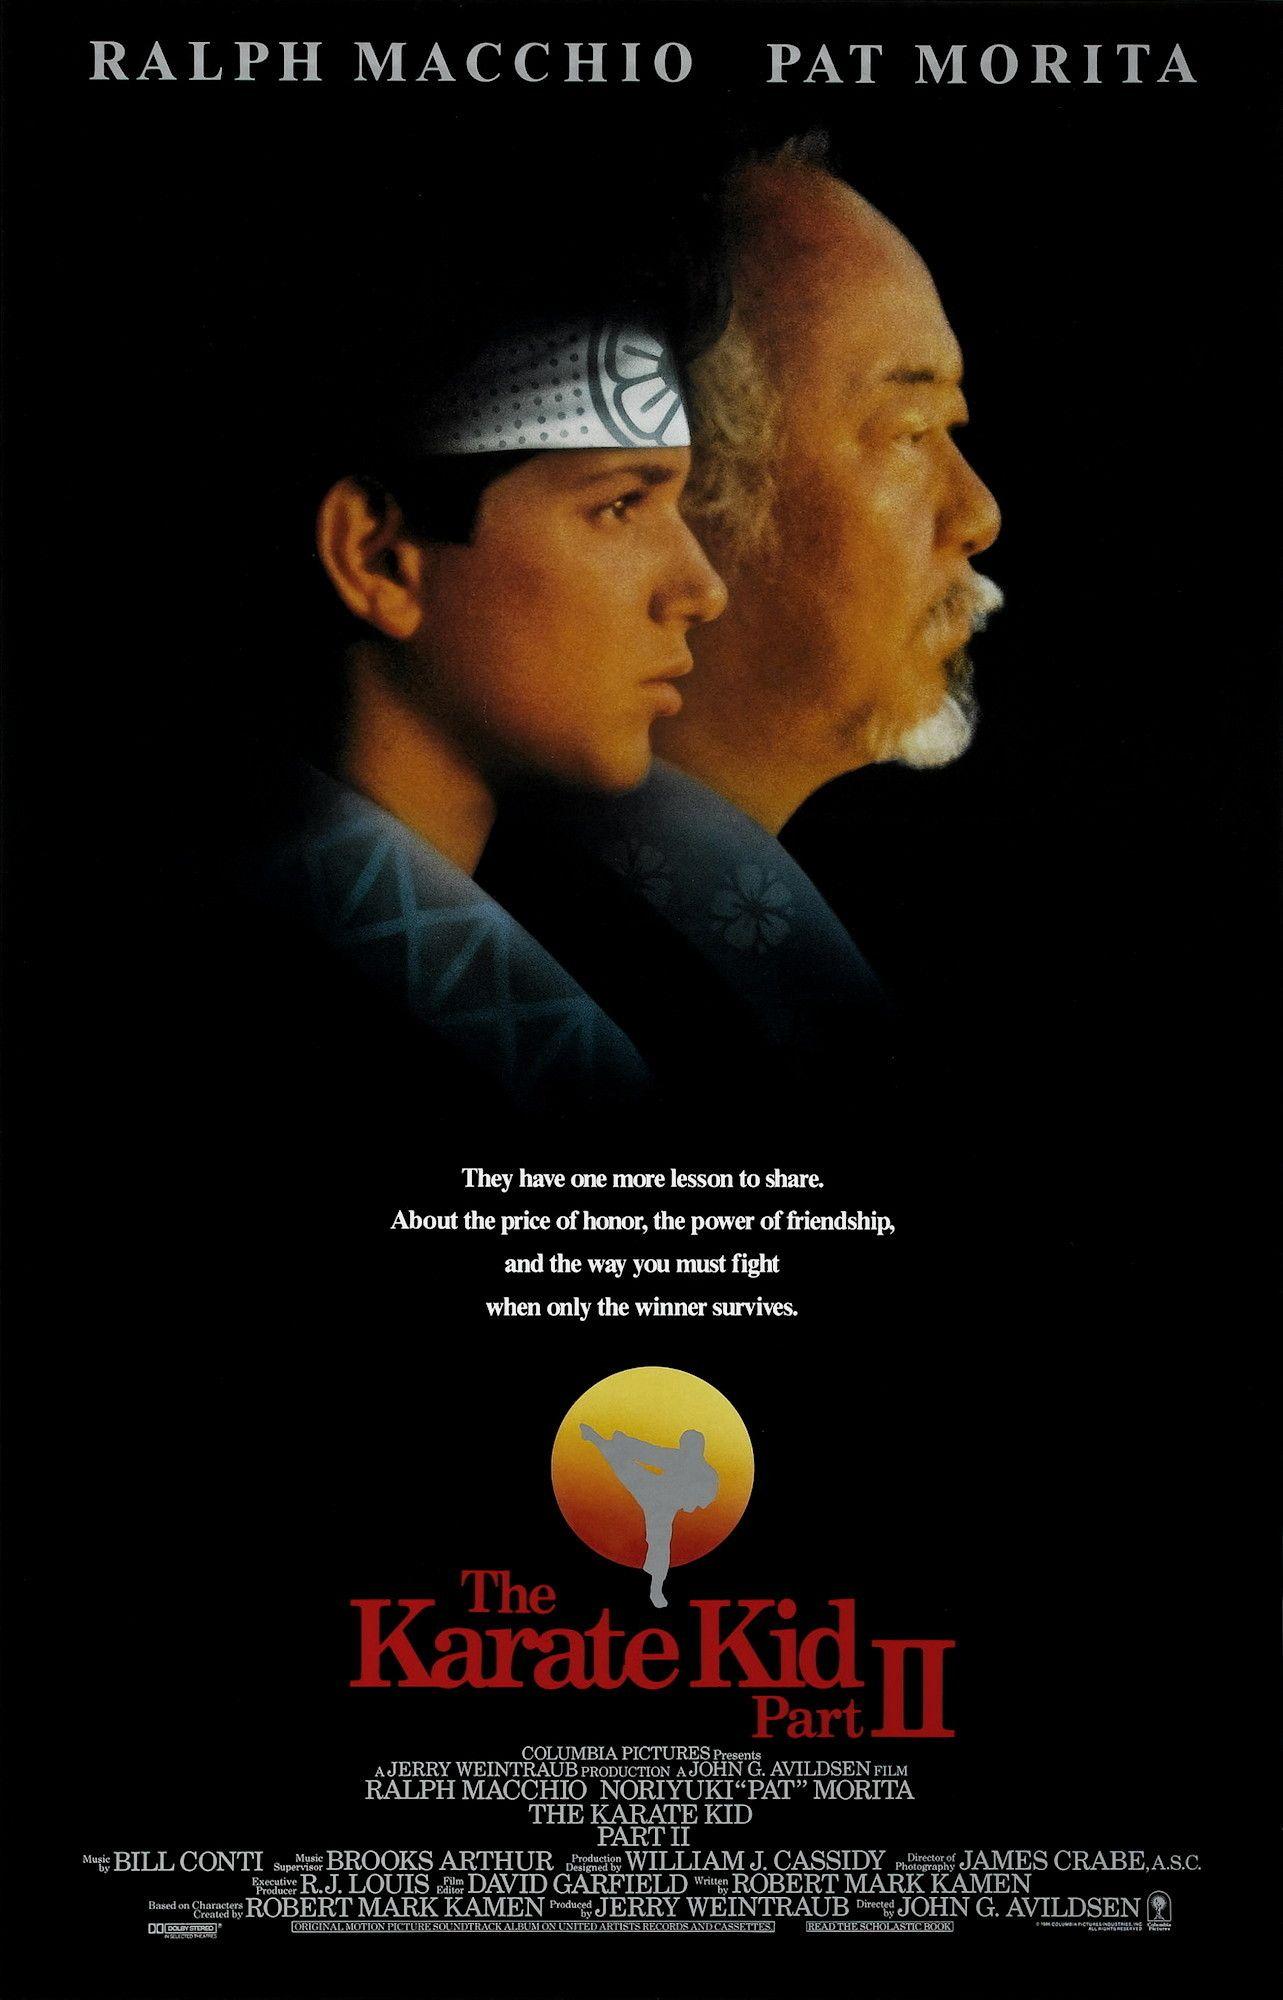 Karate Kid II - A Hora da Verdade Continua - 1986